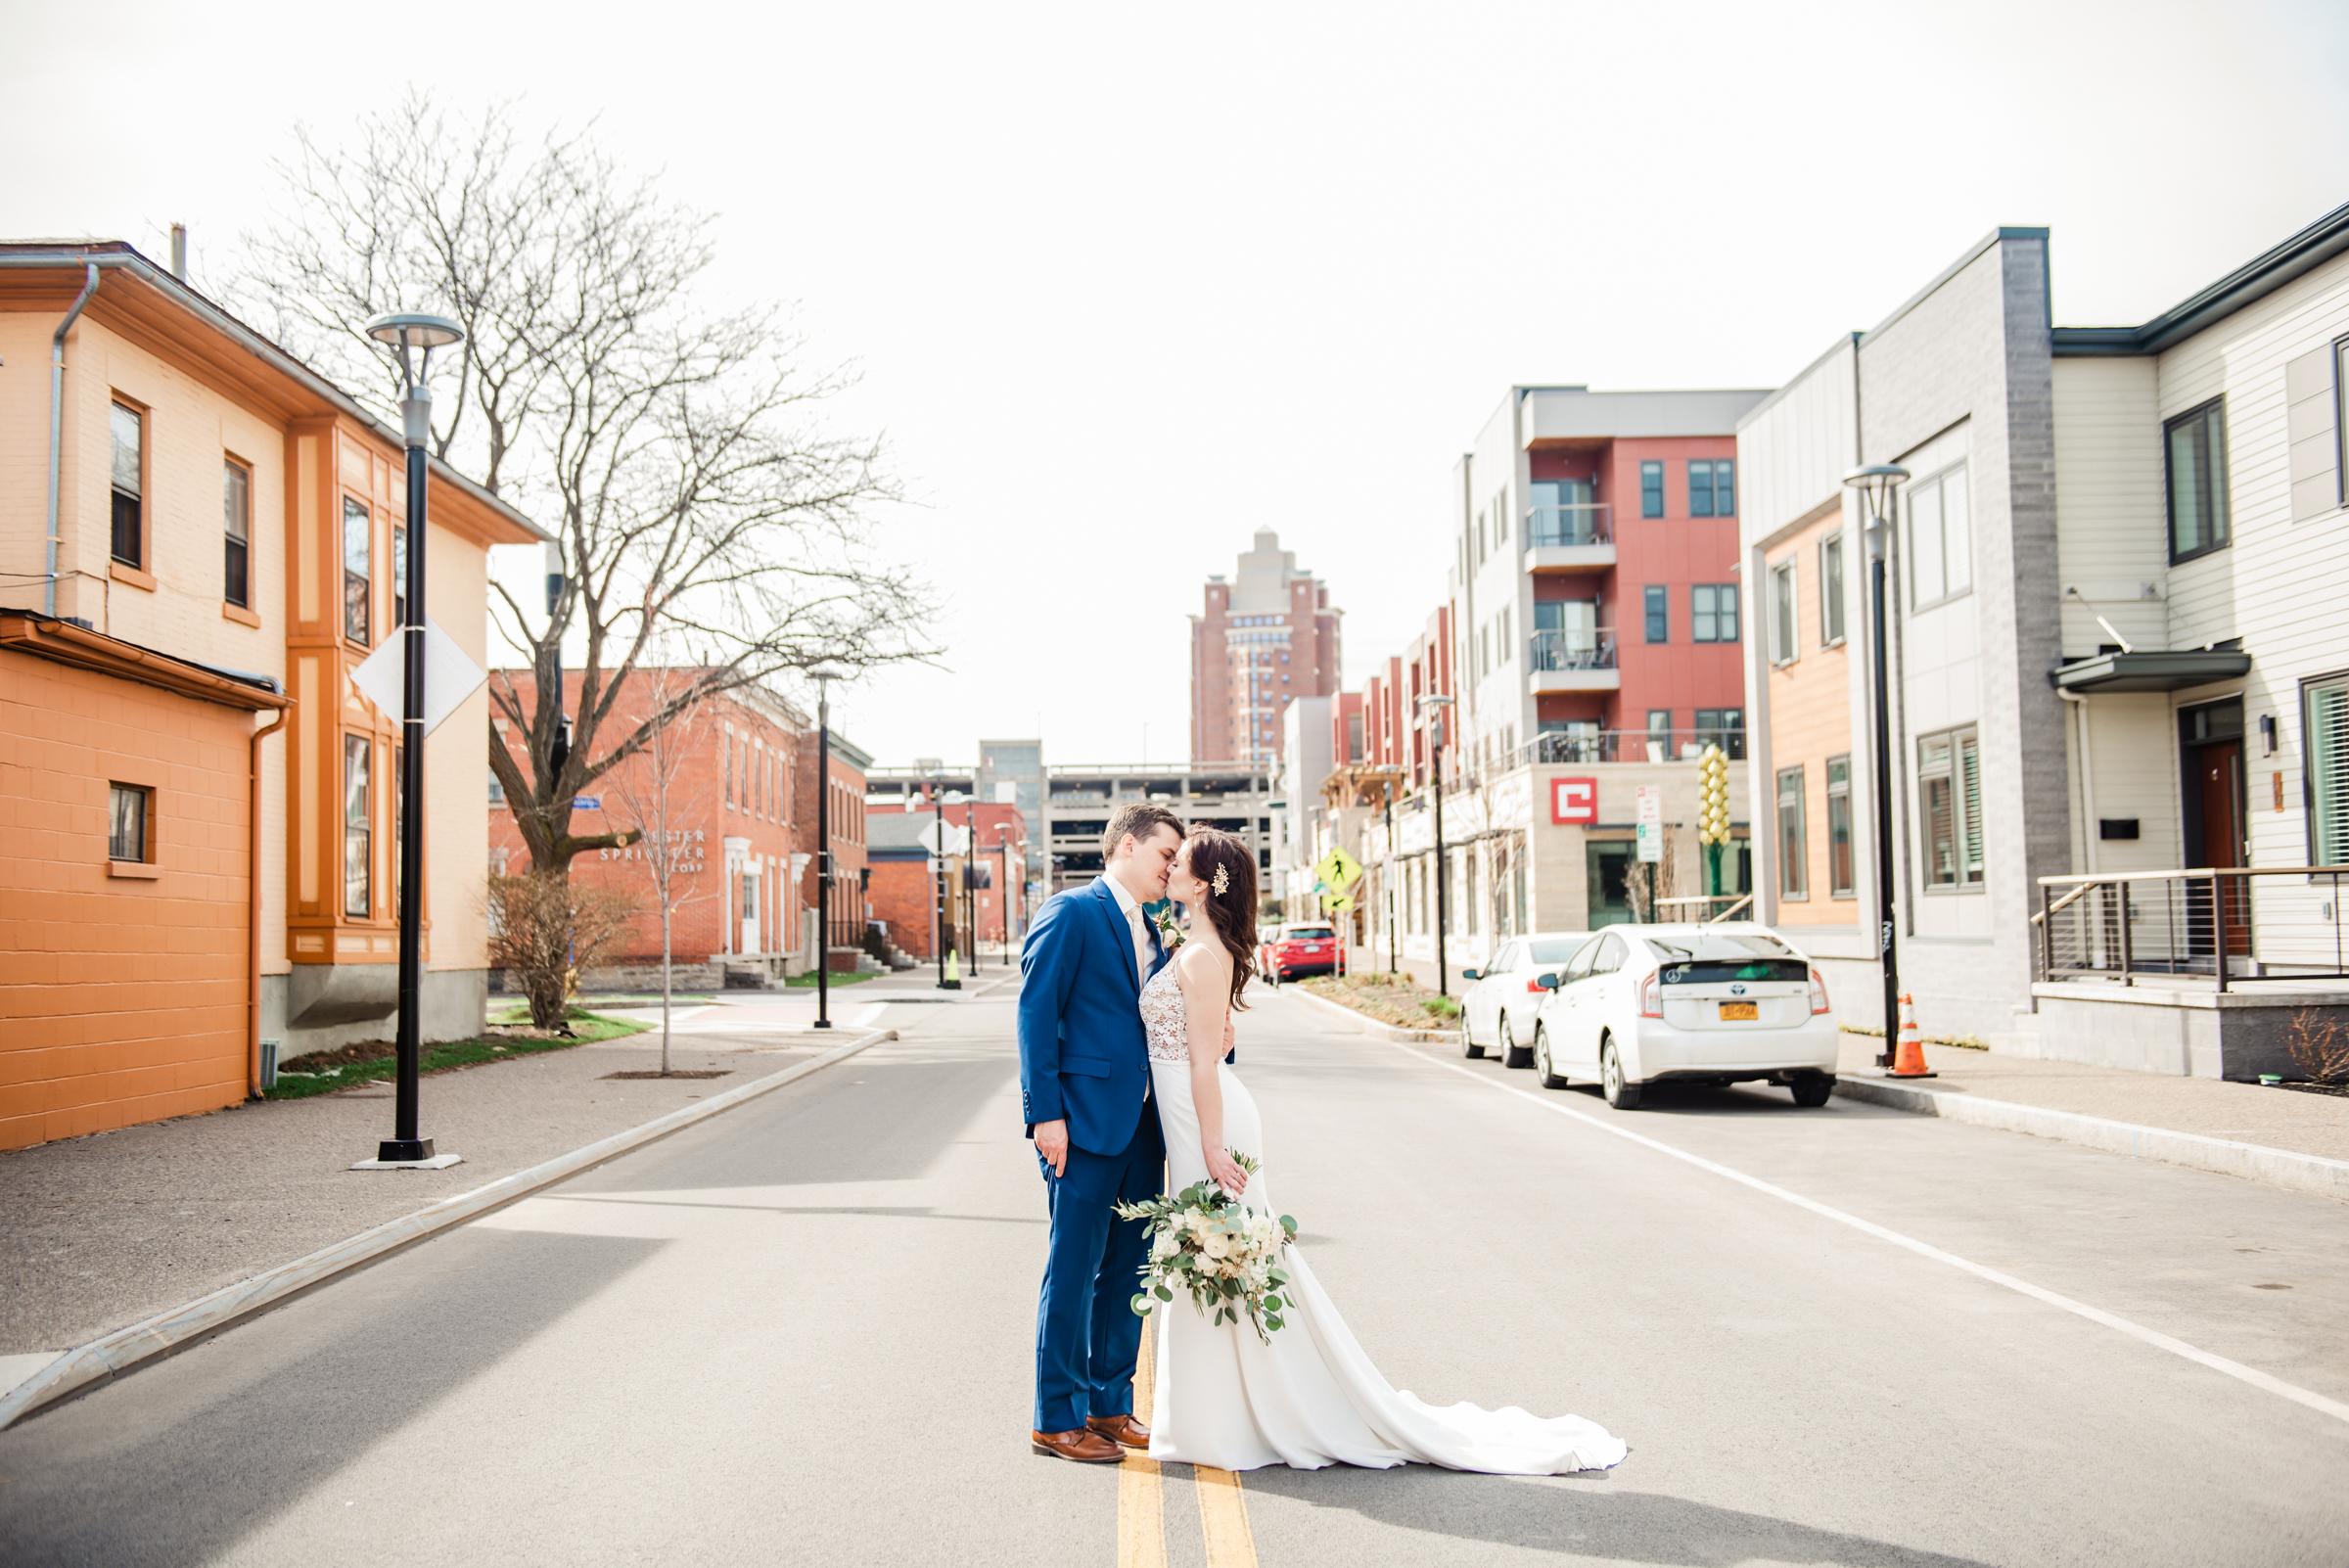 The_Arbor_LoftRochester_Wedding_JILL_STUDIO_Rochester_NY_Photographer_160049.jpg